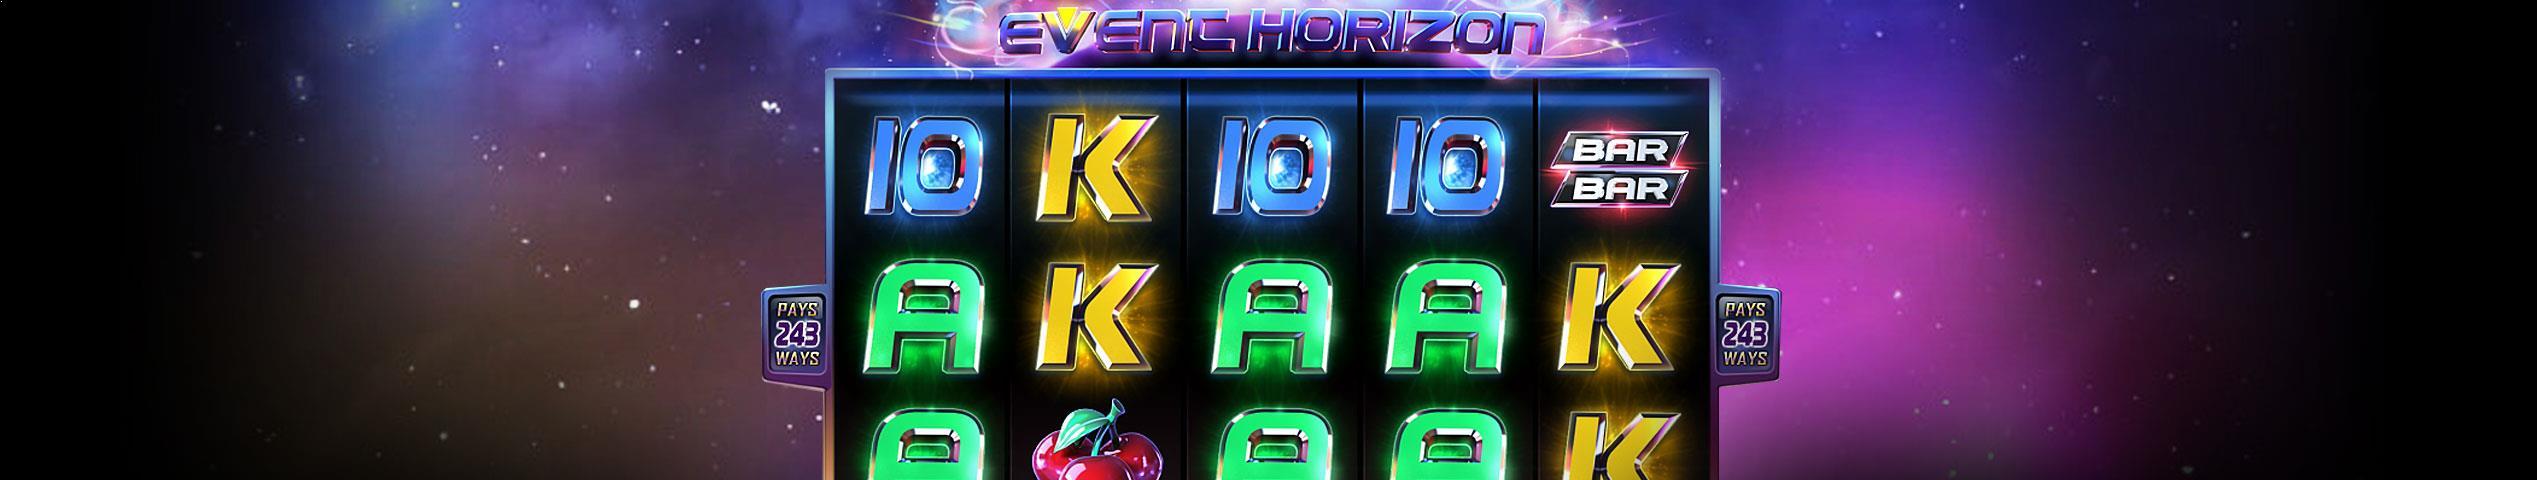 Event Horizon Multa Baft jocuri slot slider Betsoft